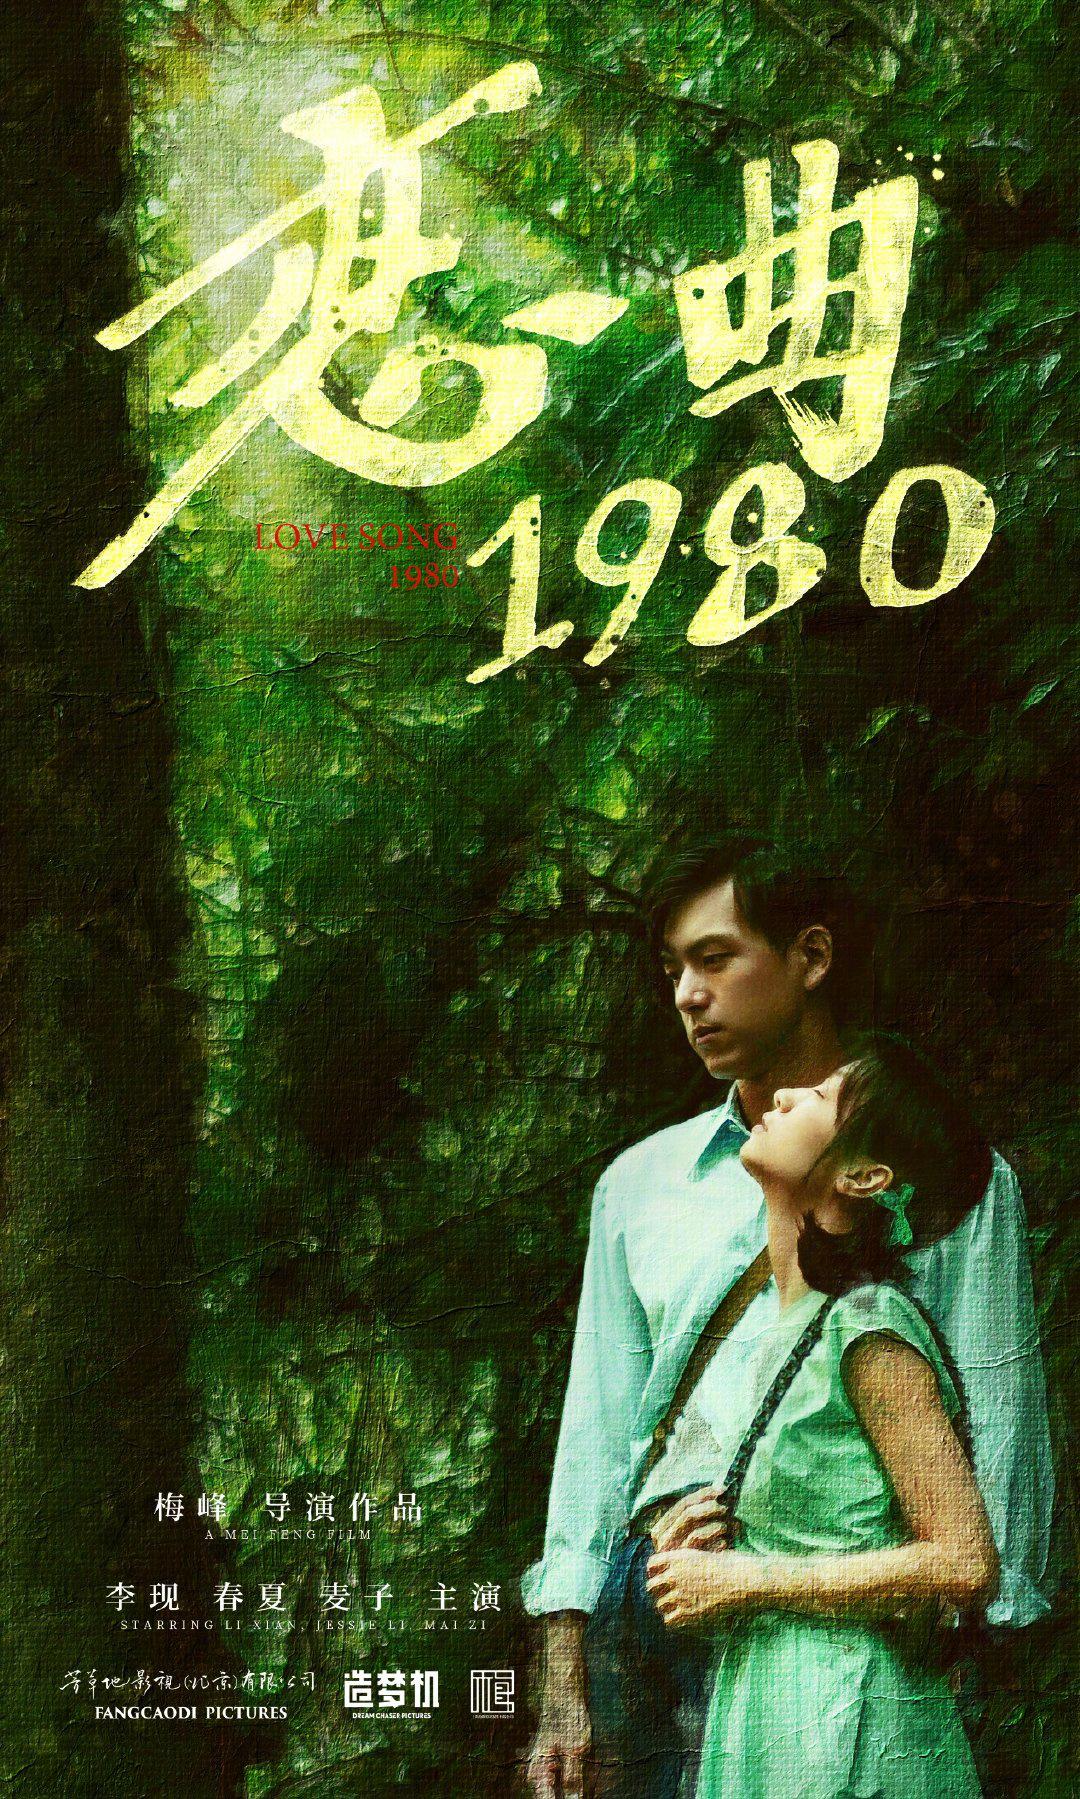 usdt钱包(caibao.it):梅峰导演《恋曲1980》曝新海报 李现春夏浪漫相依